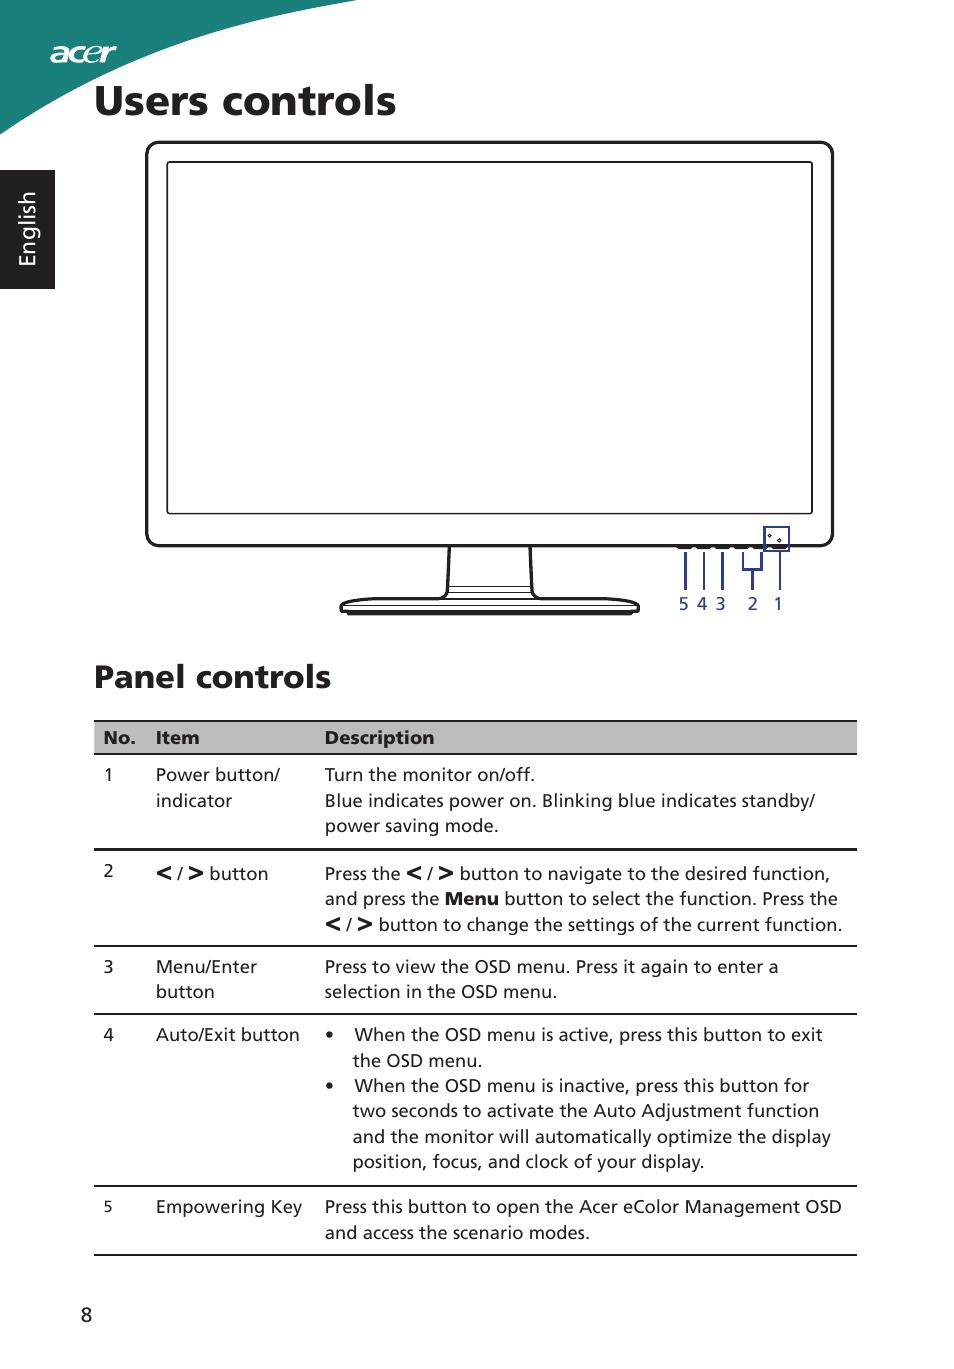 Users controls, Panel controls | Acer S220HQL User Manual